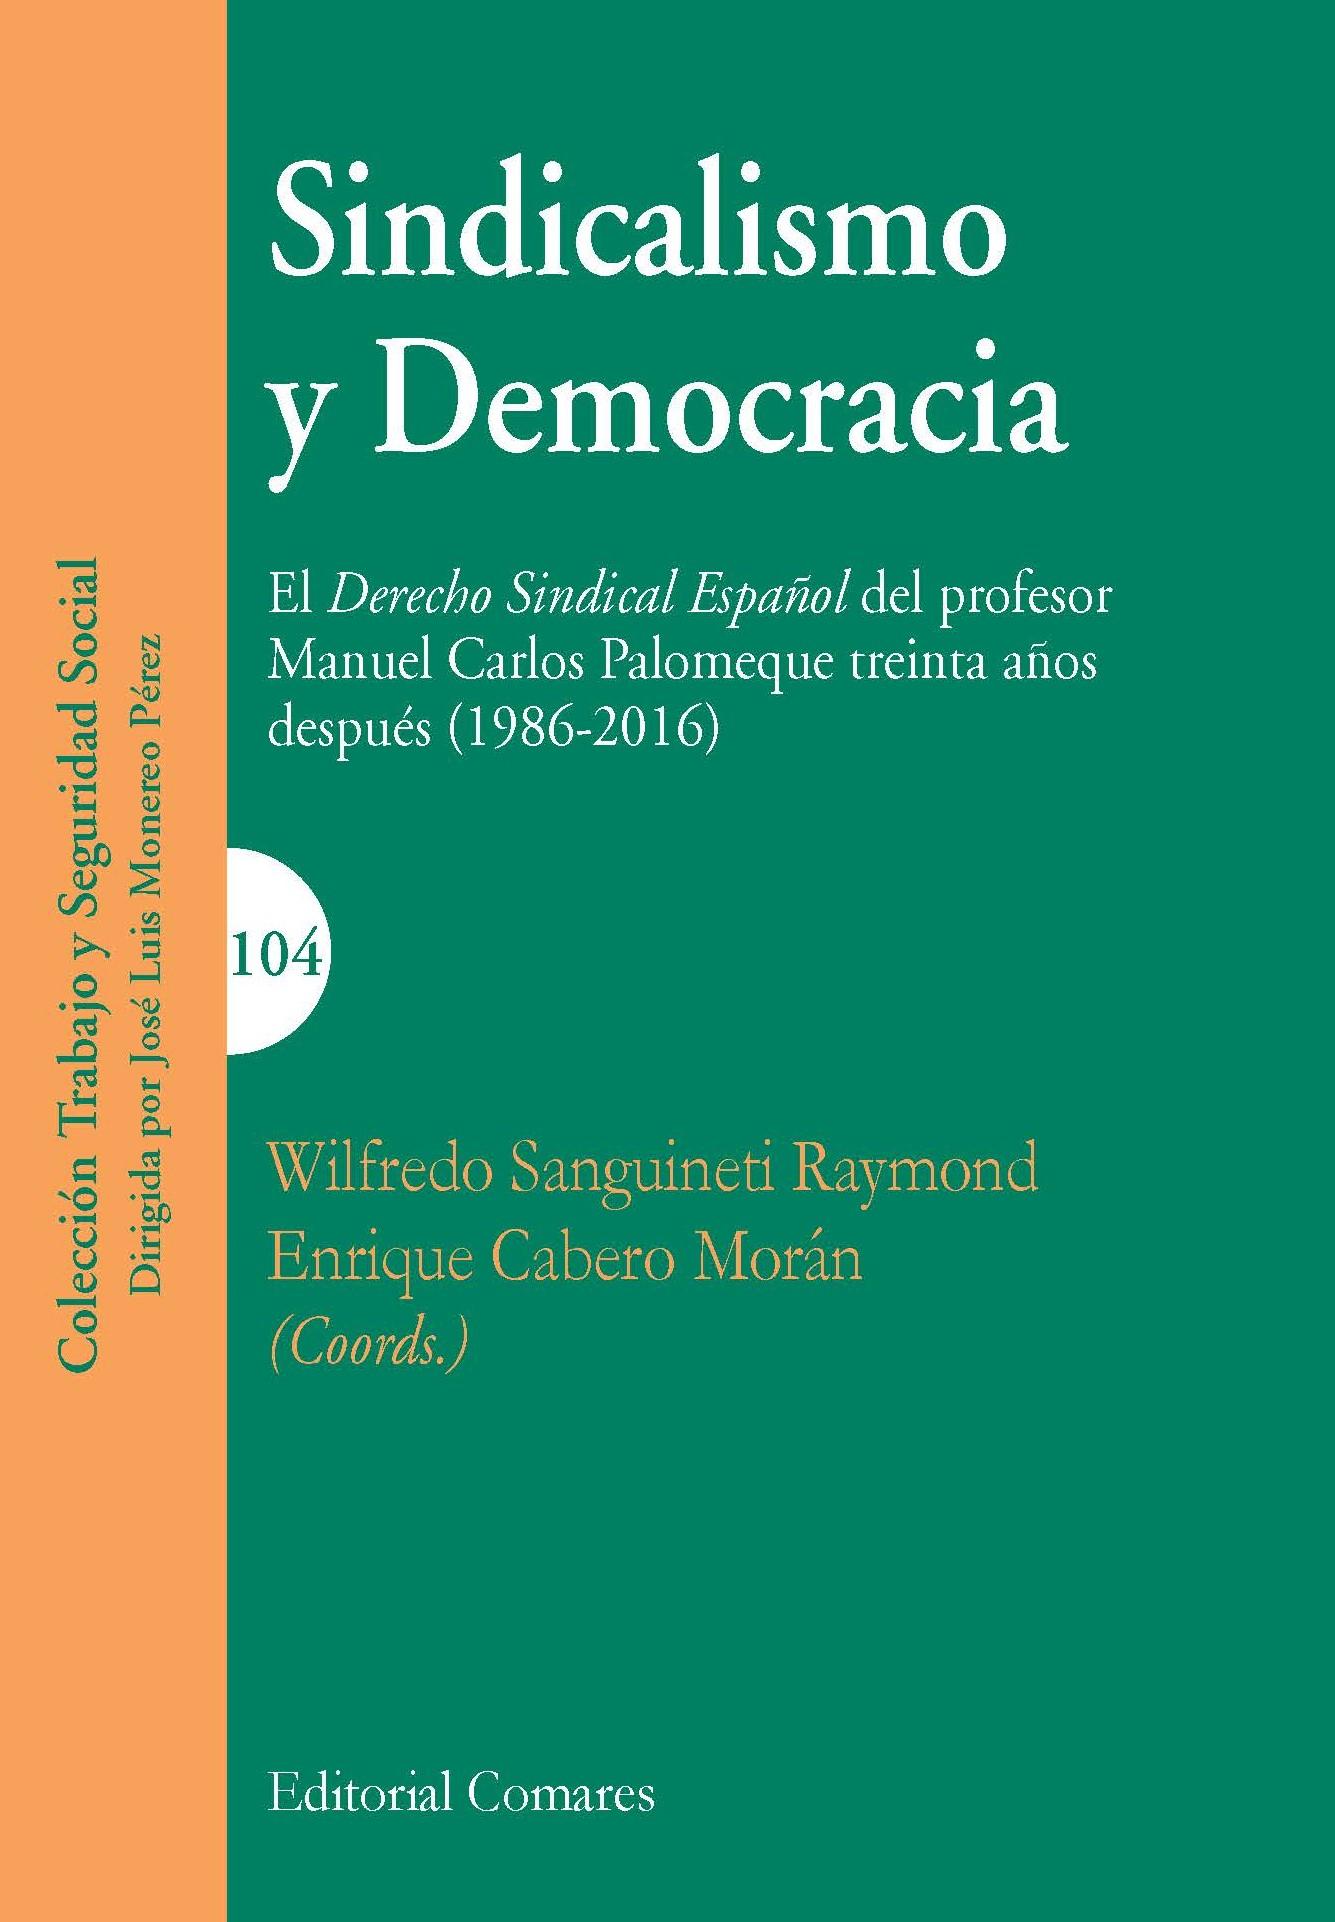 Libertad sindical | El blog de Wilfredo Sanguineti